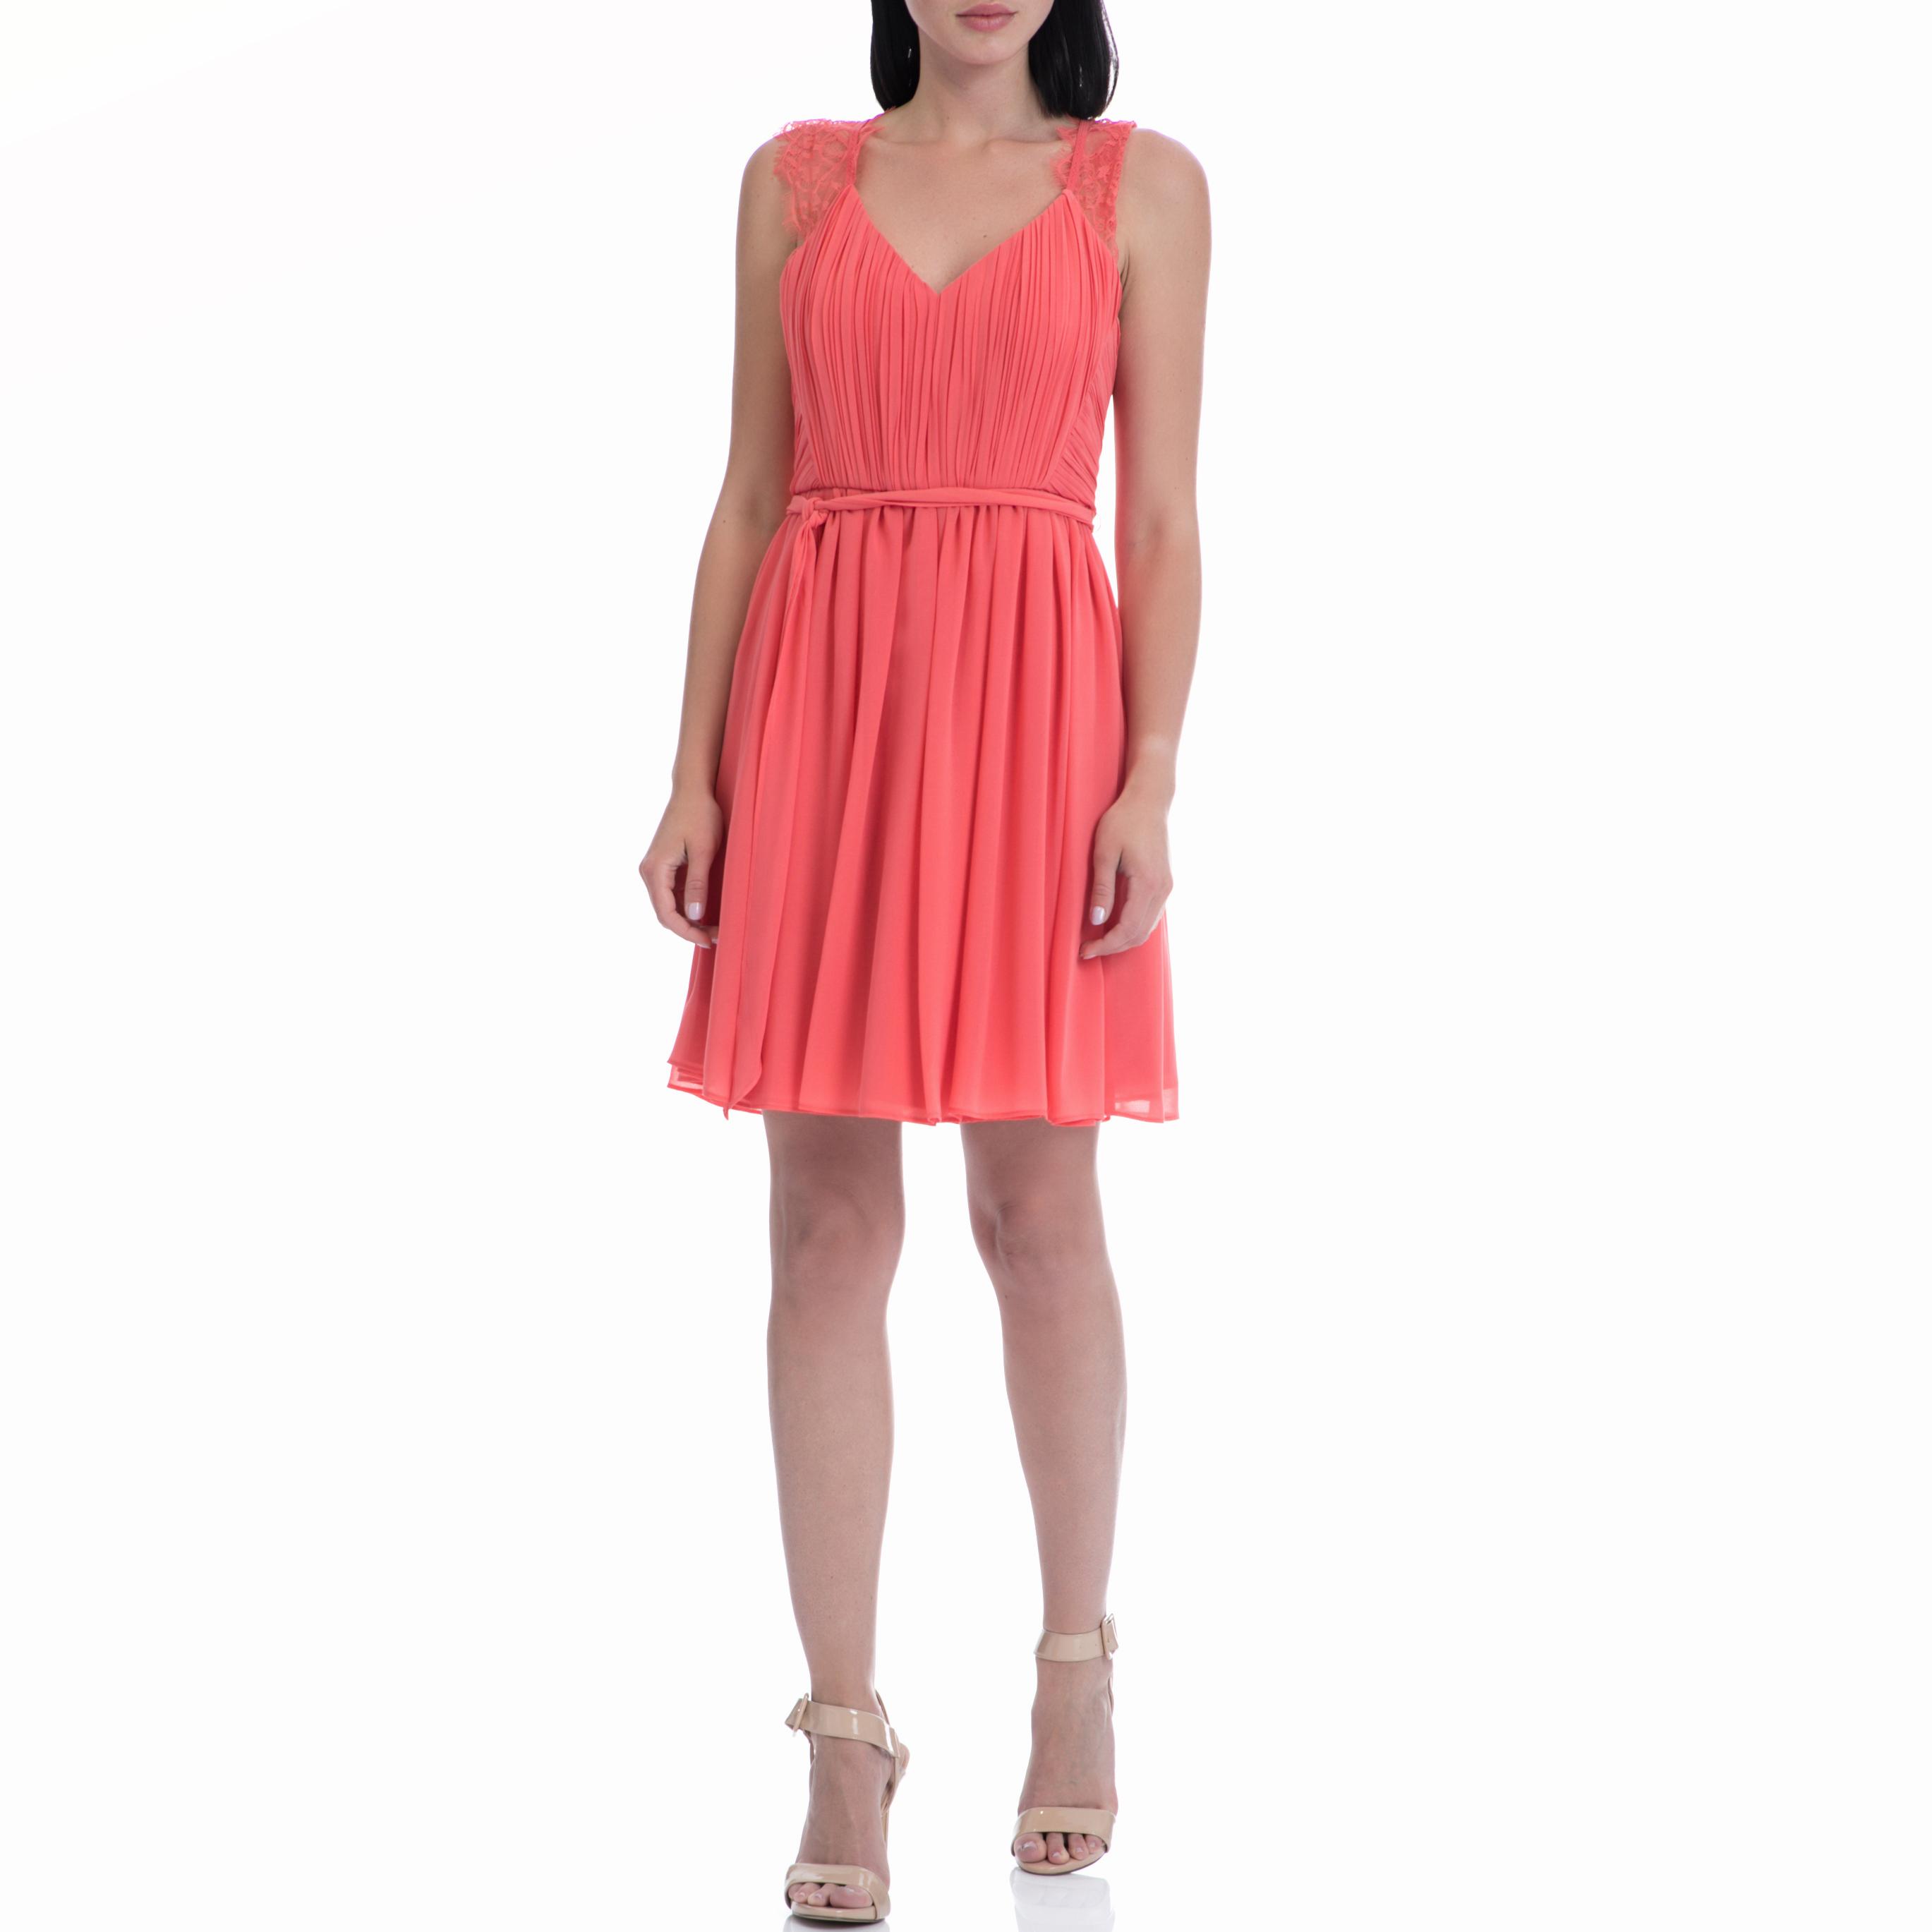 MOTIVI - Φόρεμα MOTIVI κοραλί γυναικεία ρούχα φορέματα μίνι